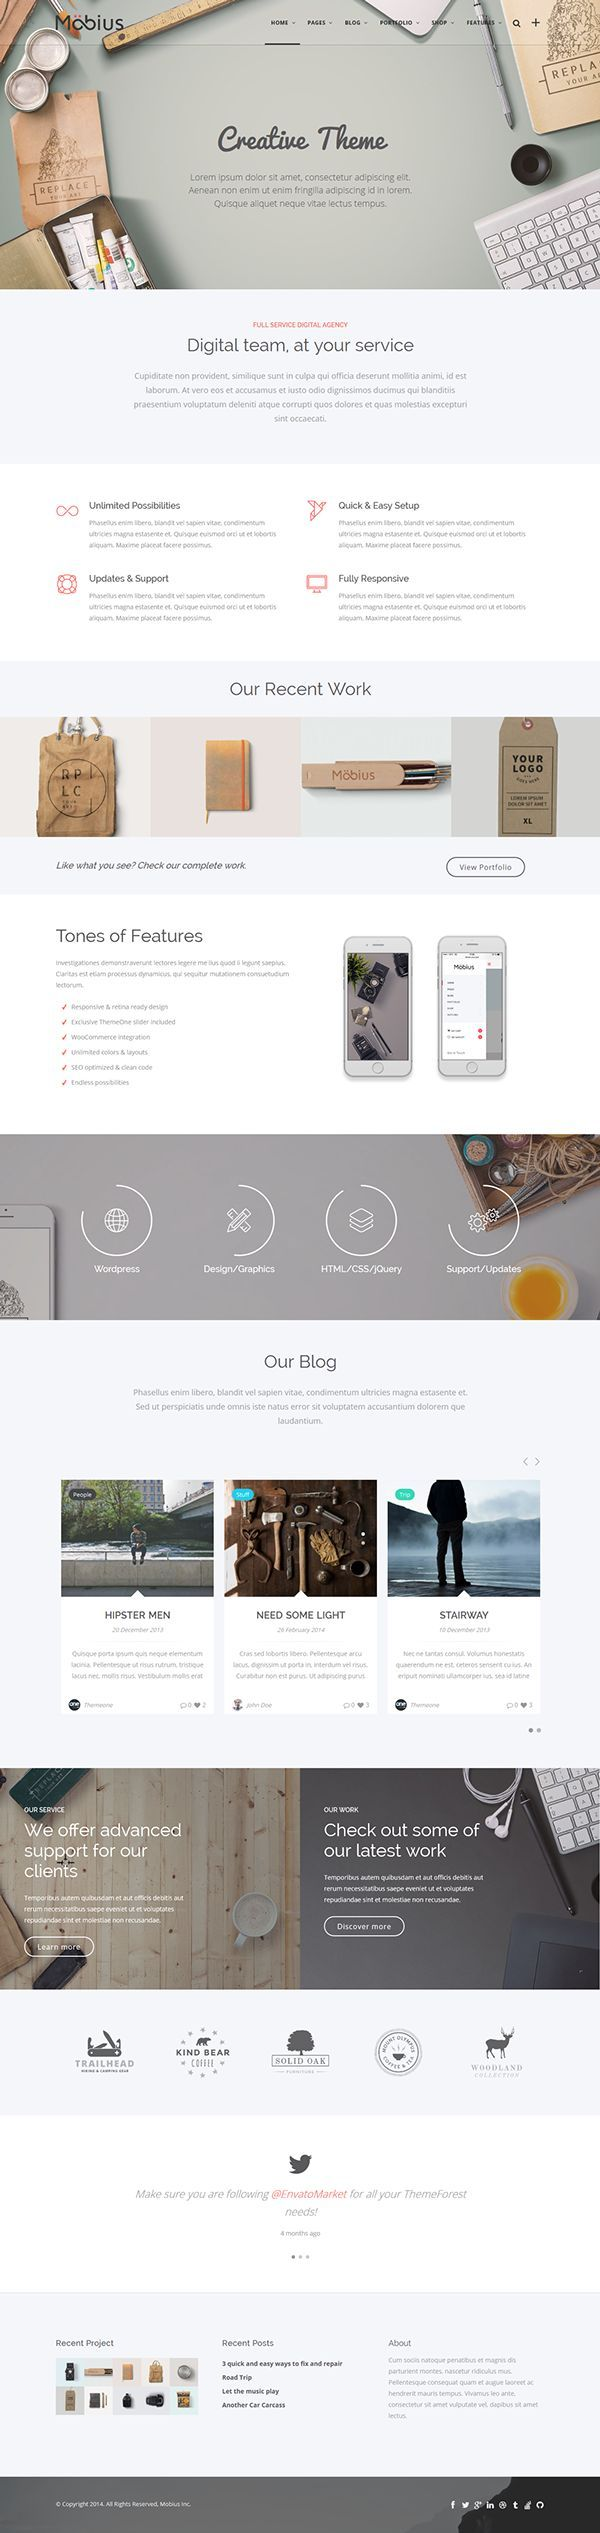 Mobius - Responsive Multi-Purpose WordPress Theme by Theme-One #wordpress #website #webdesign #themeforest